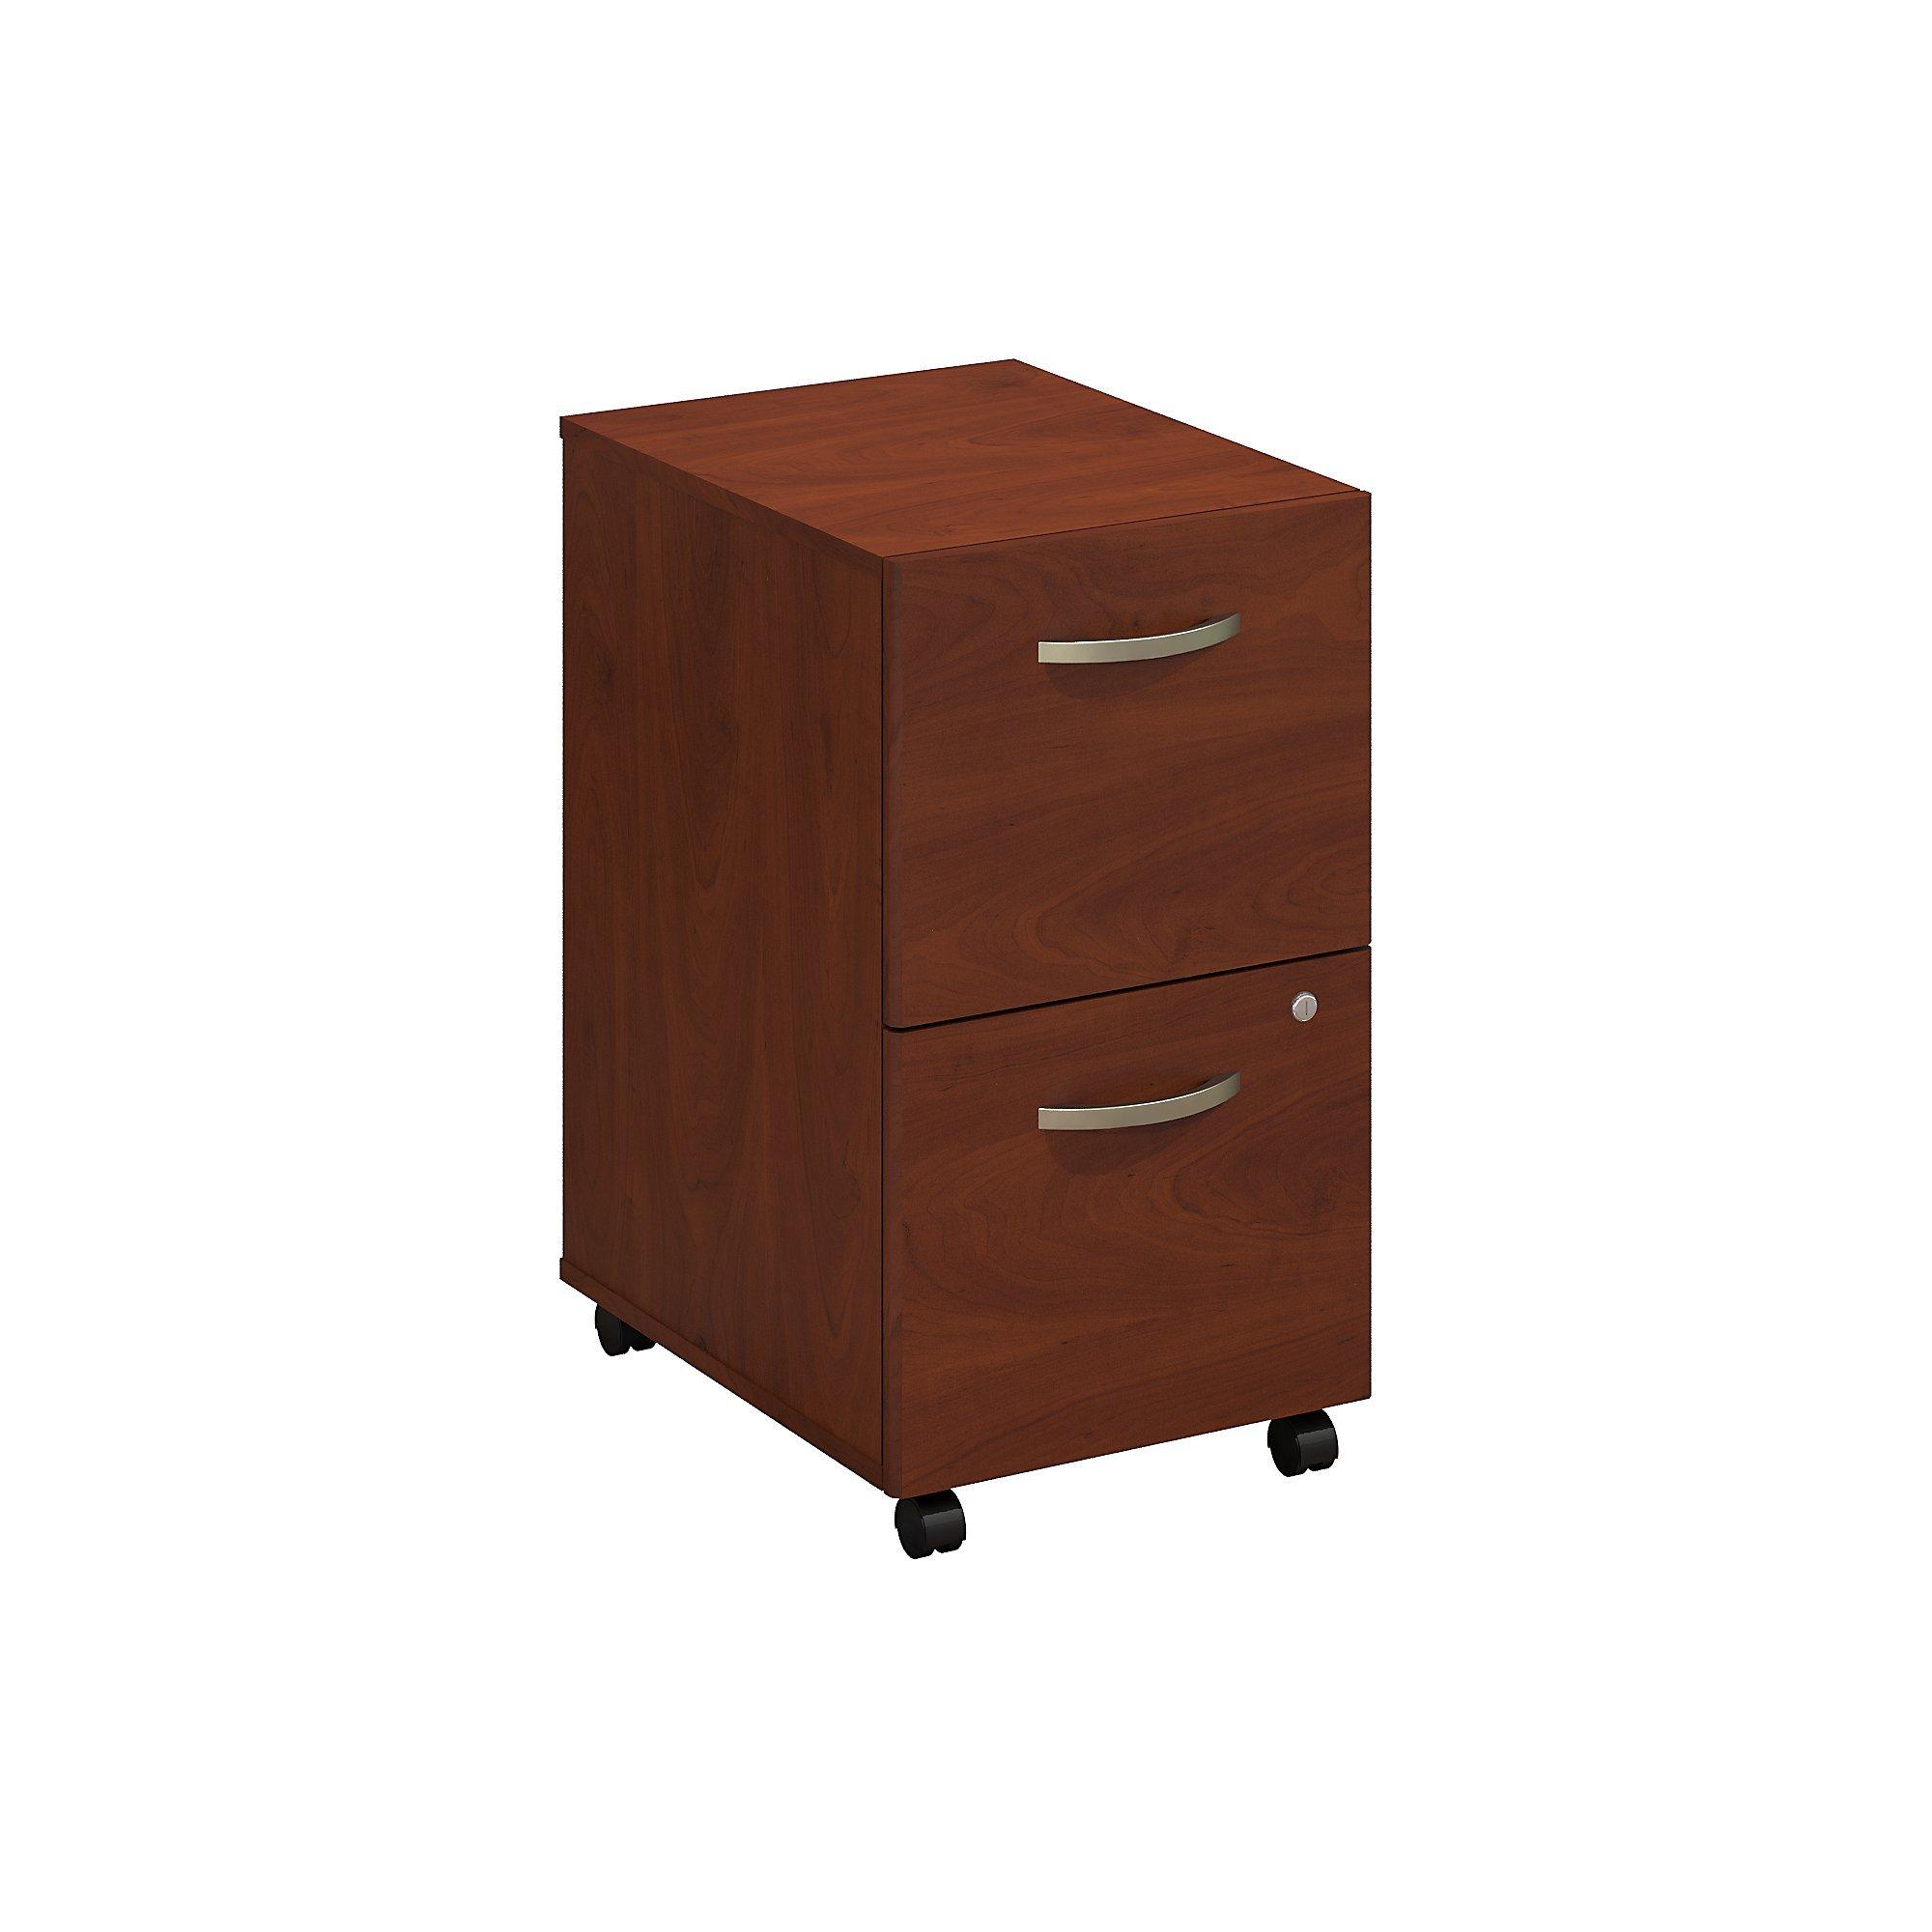 Bush Business Furniture Series C Elite 2 Drawer Mobile File Cabinet in Hansen Cherry by Bush Business Furniture